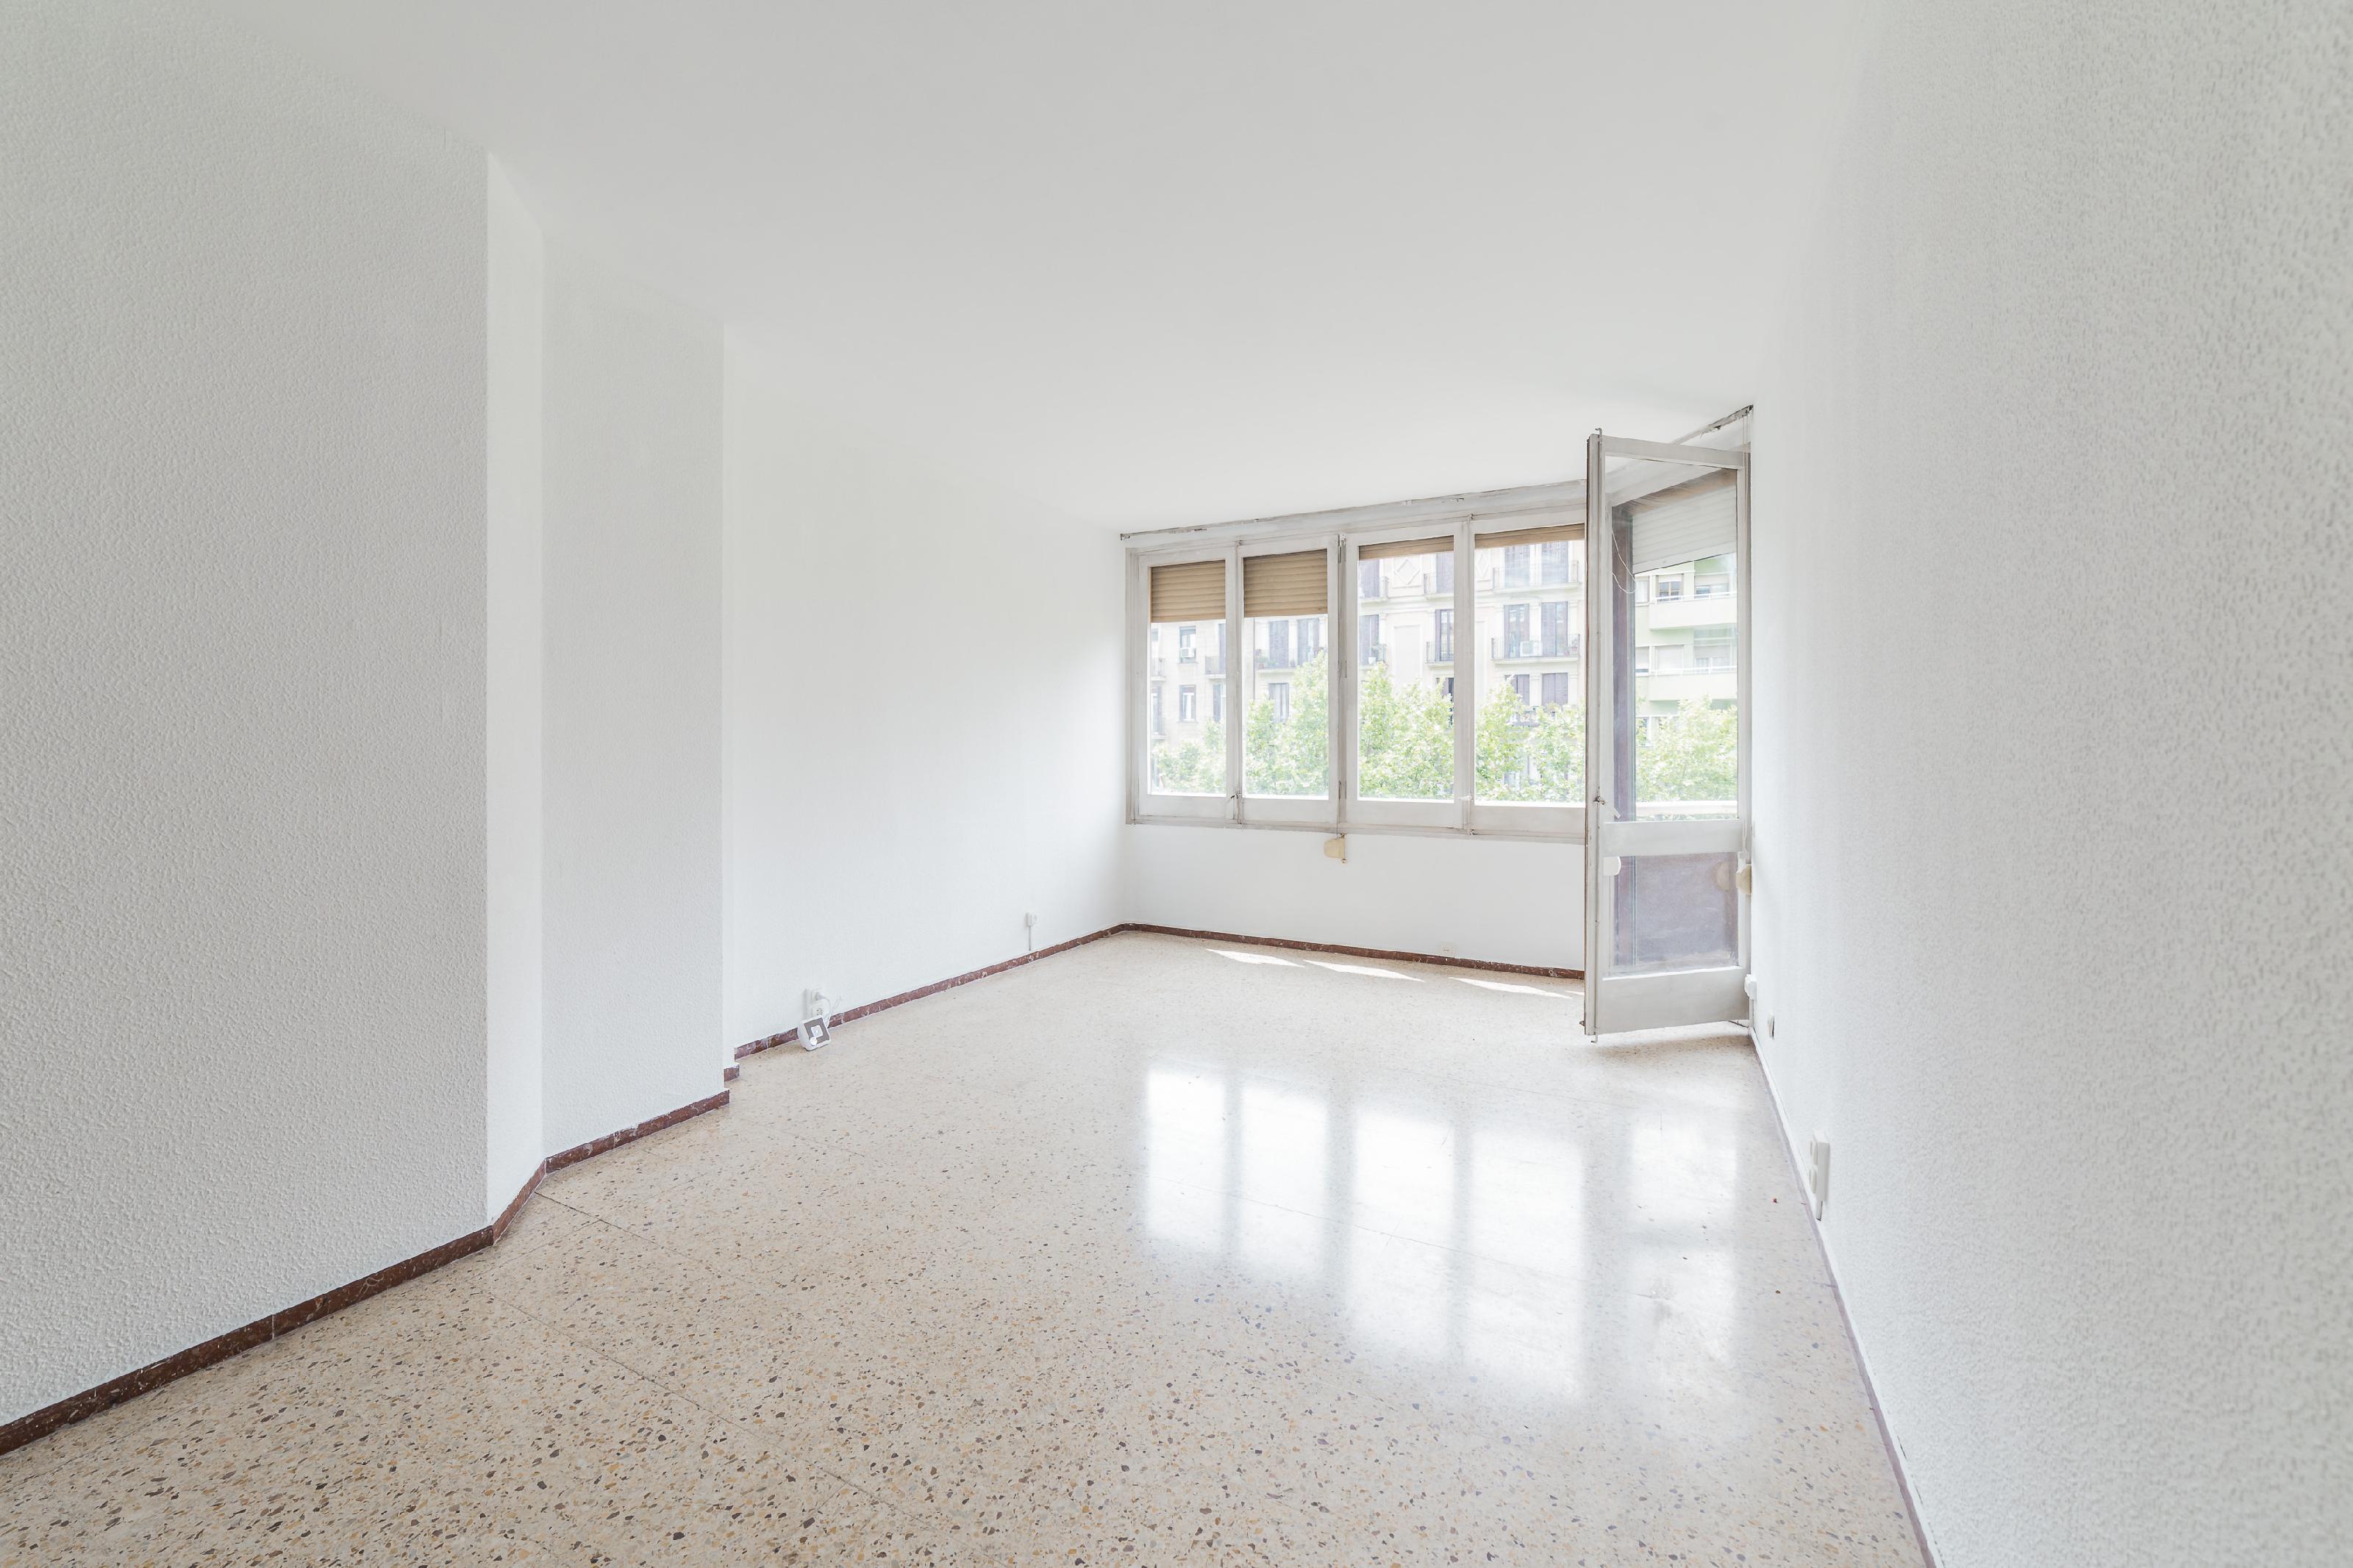 247624 Flat for sale in Eixample, Sant Antoni 6